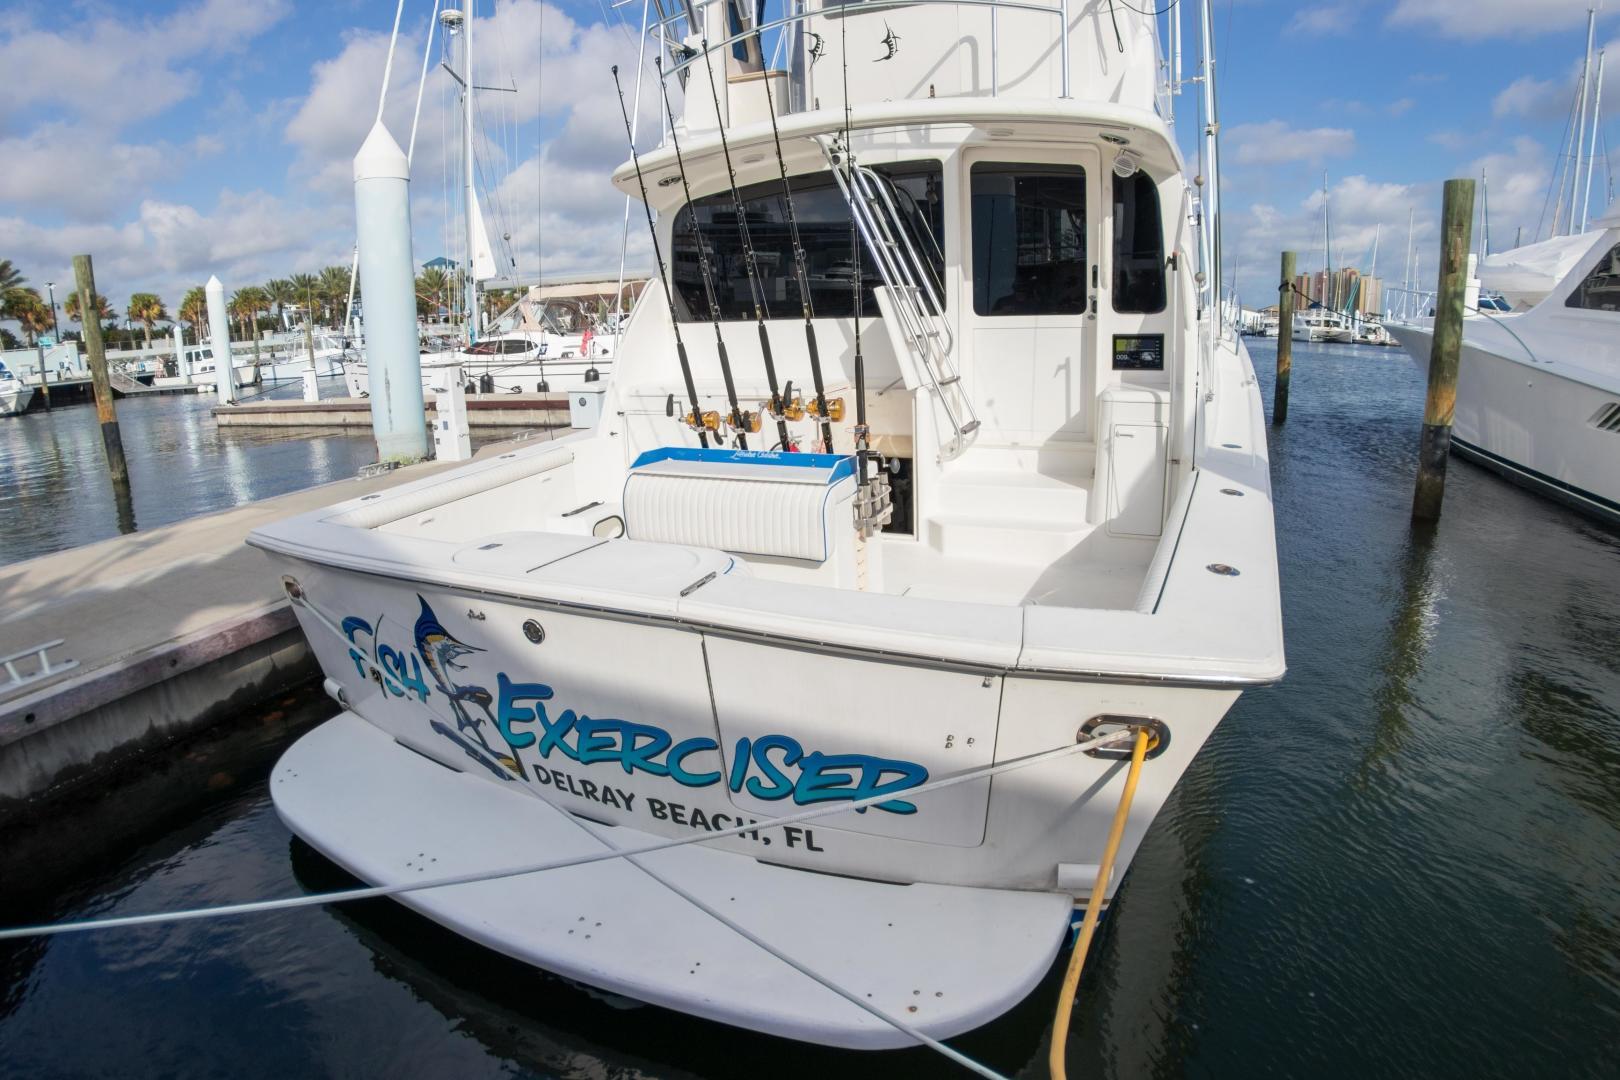 Ocean Yachts 2000-FISH EXERCISER Riviera Beach-Florida-United States-1552162 | Thumbnail